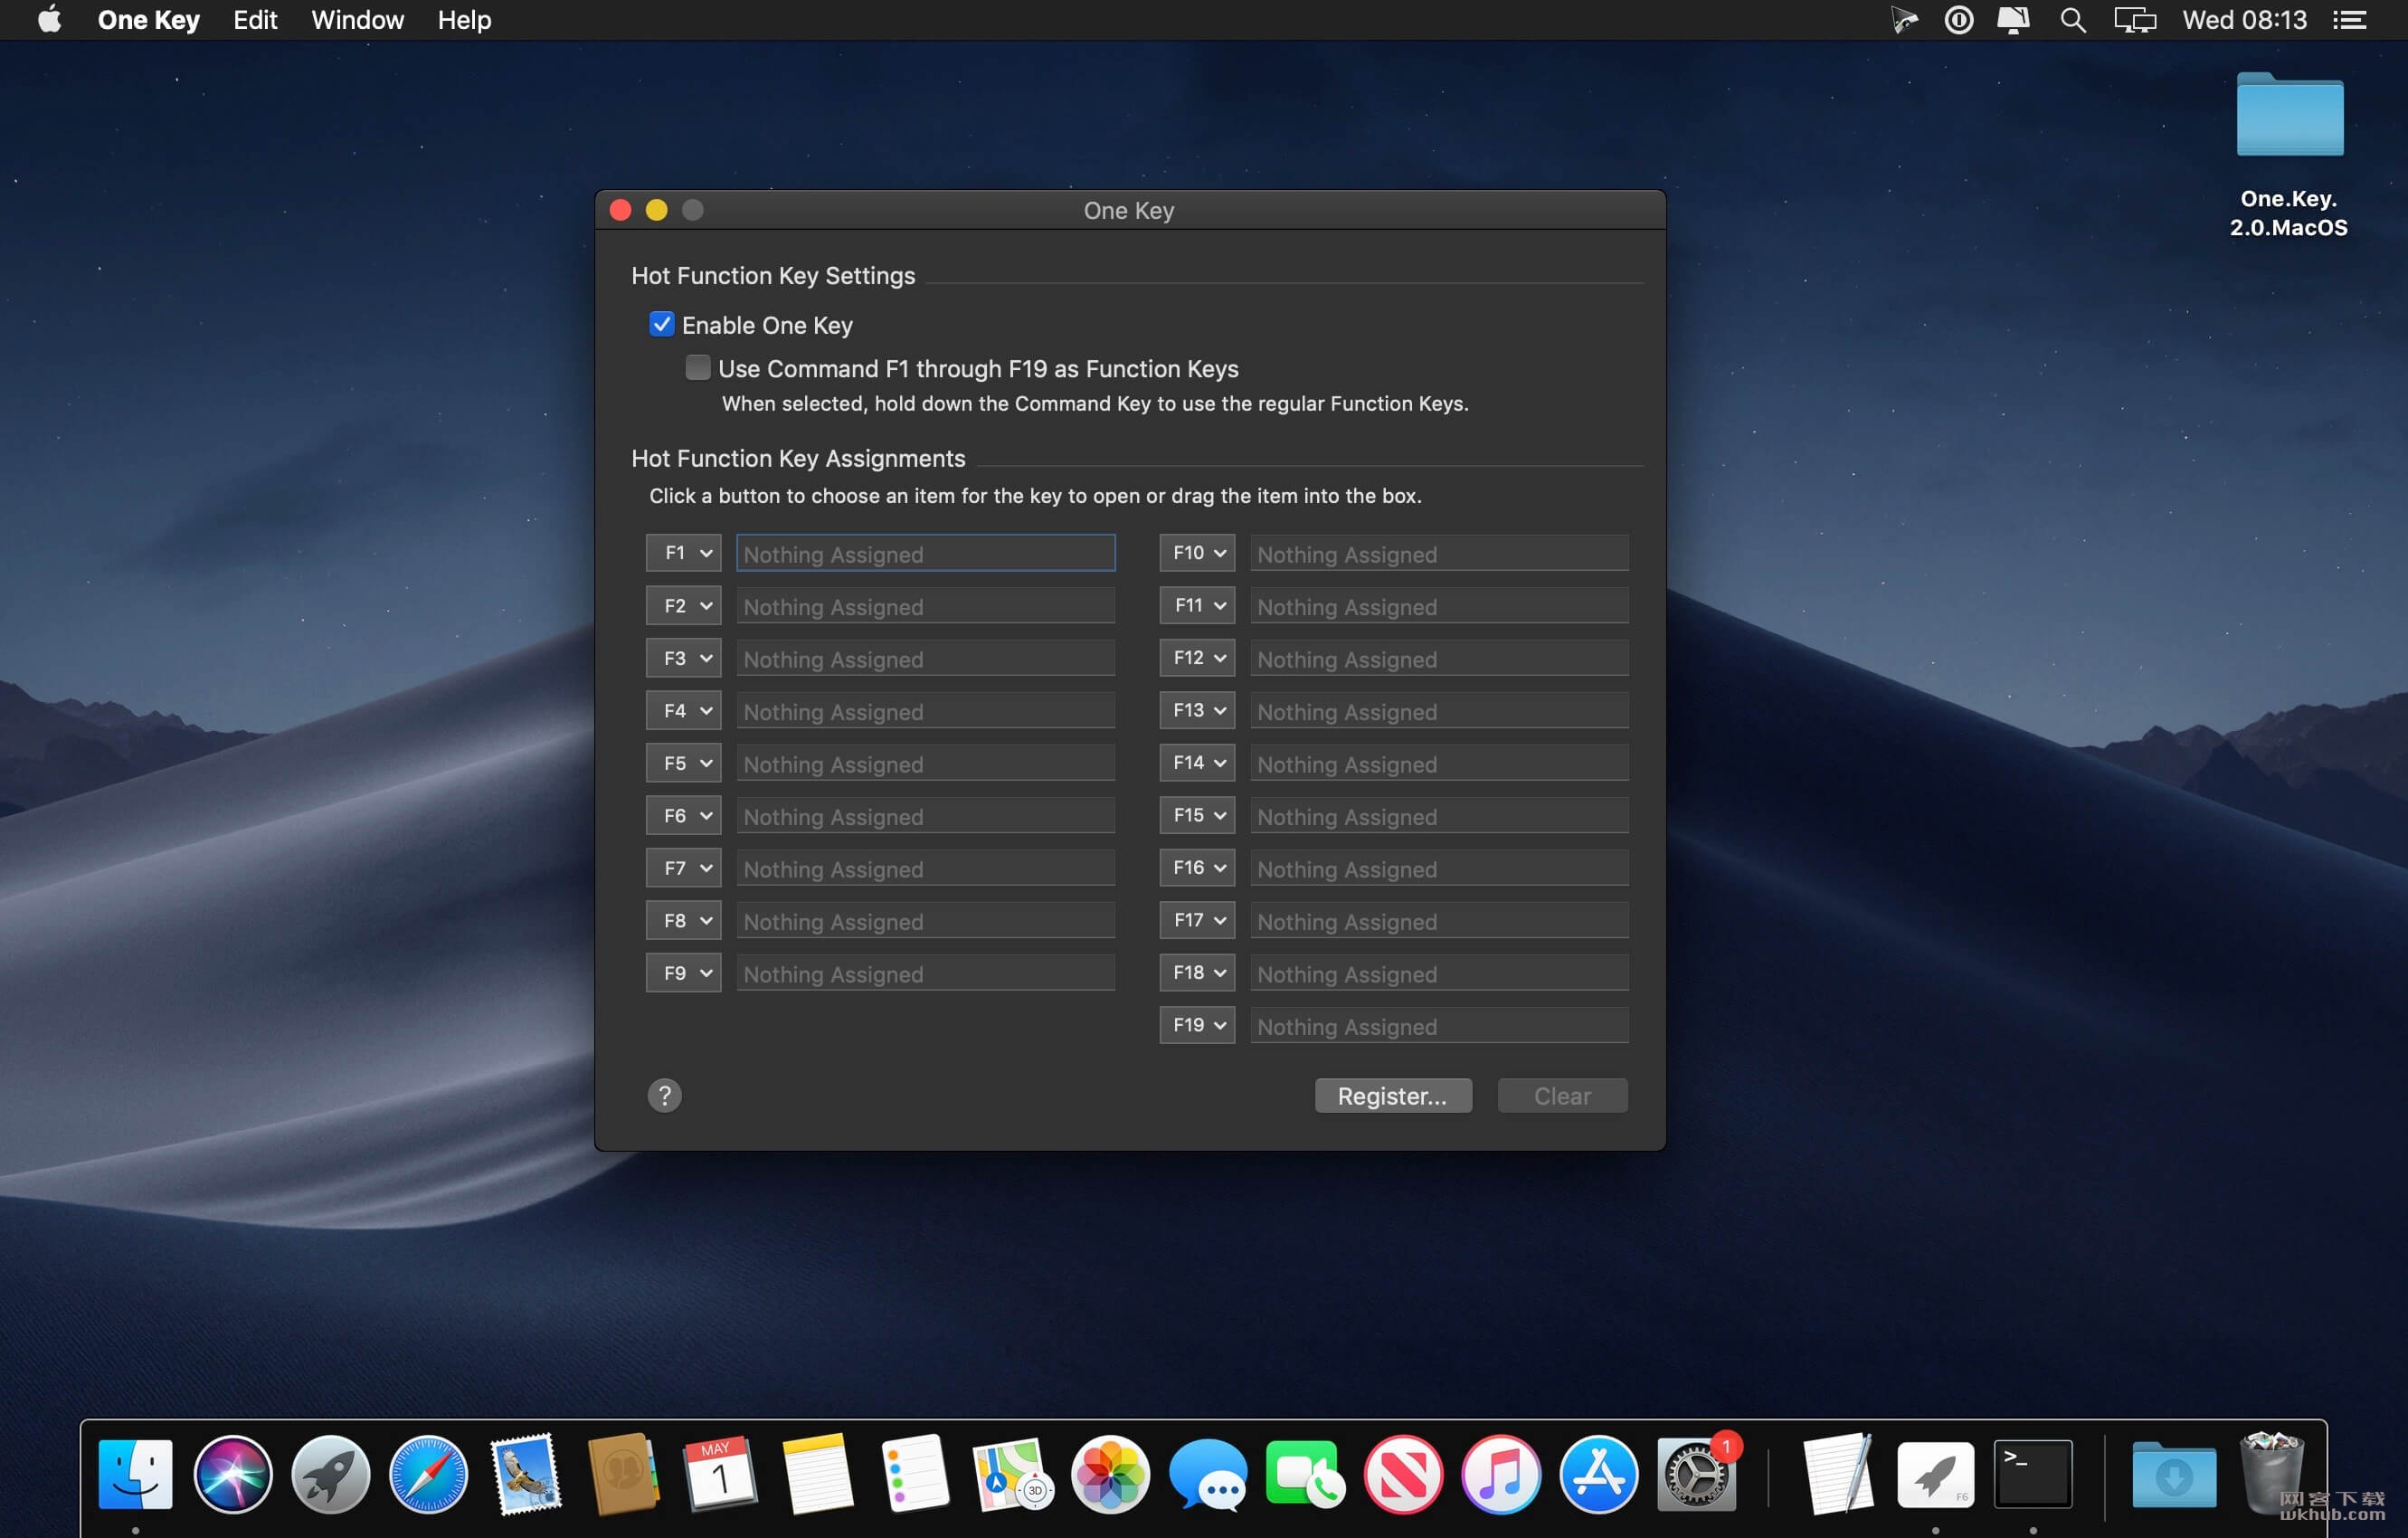 One Key 2.0 快捷键功能设置工具